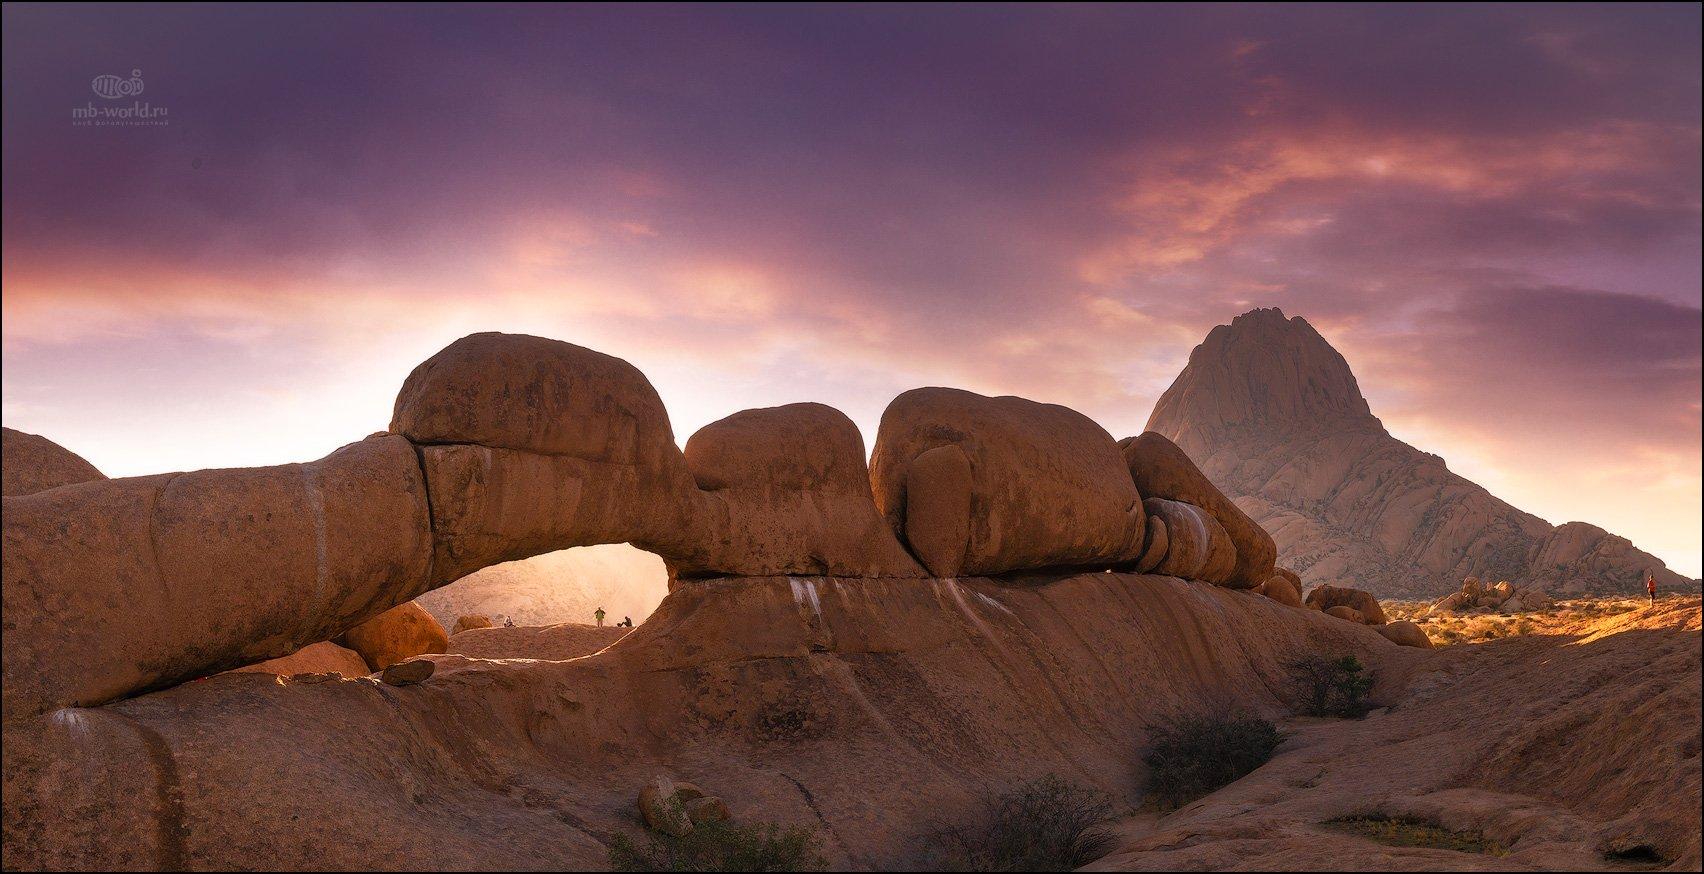 Намибия, пейзаж, закат, парк, Михаил Воробьев